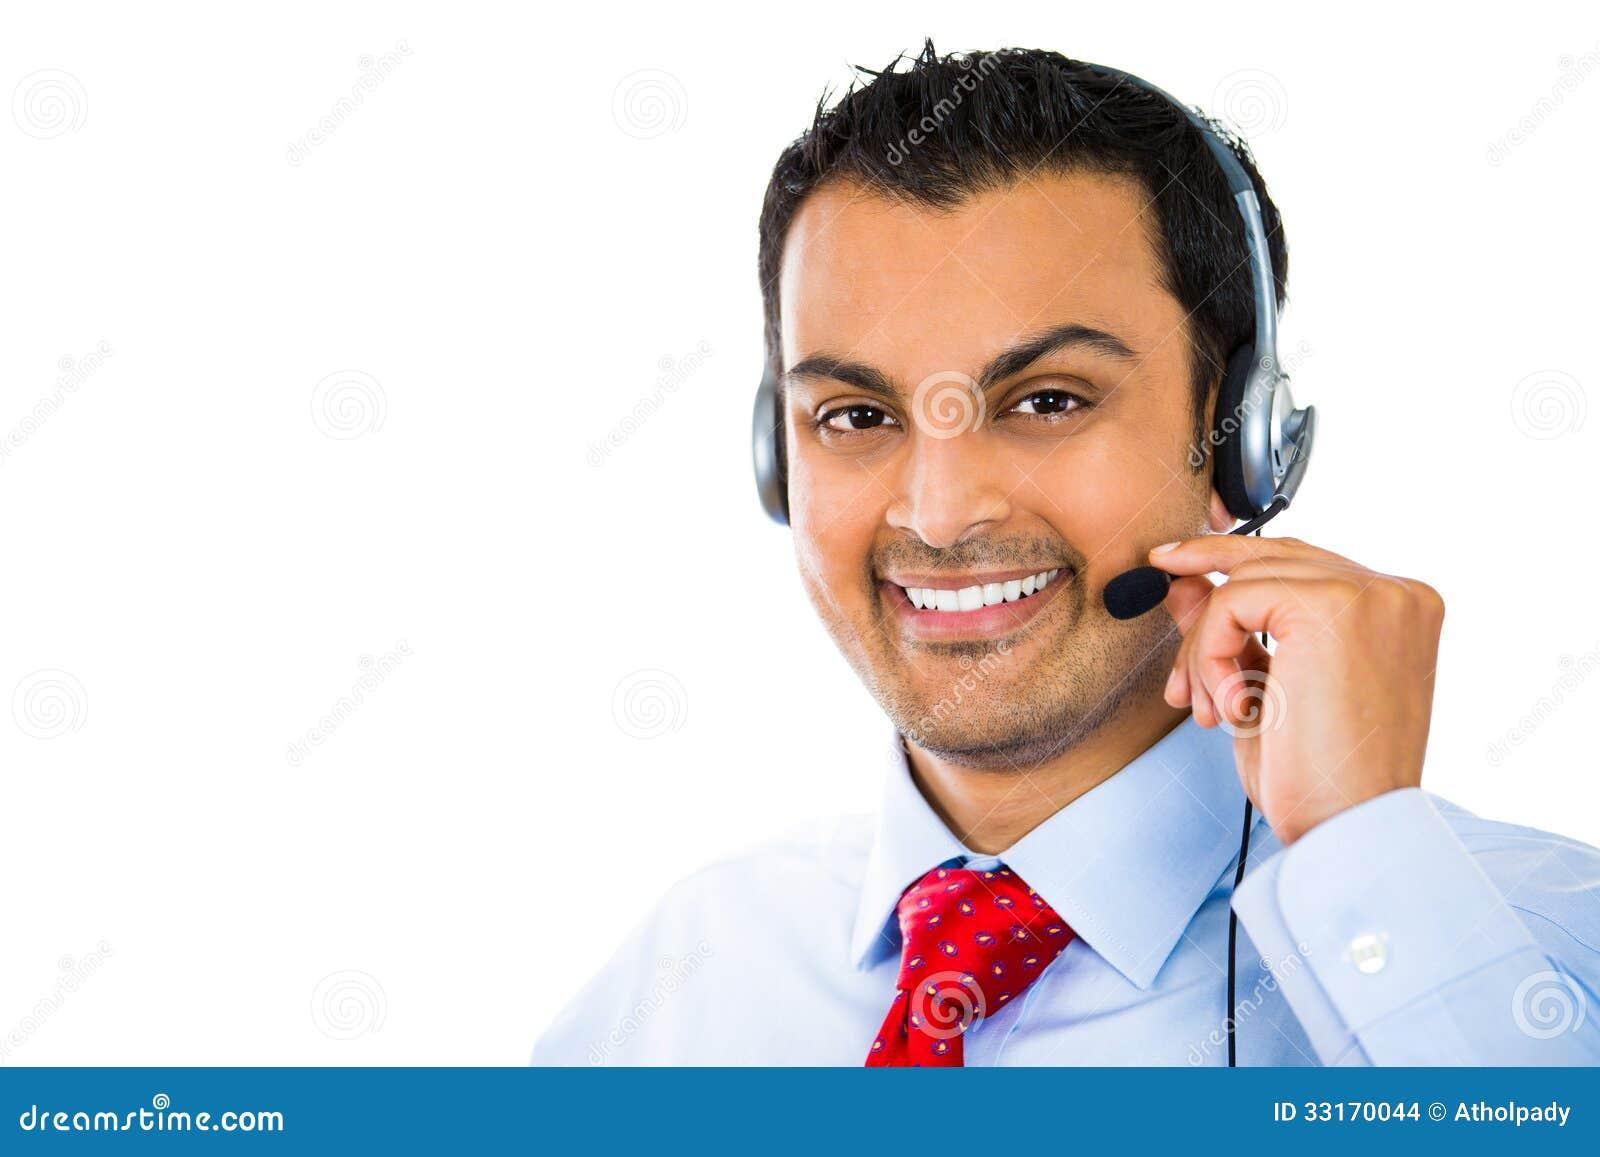 Travel Web Customer Service